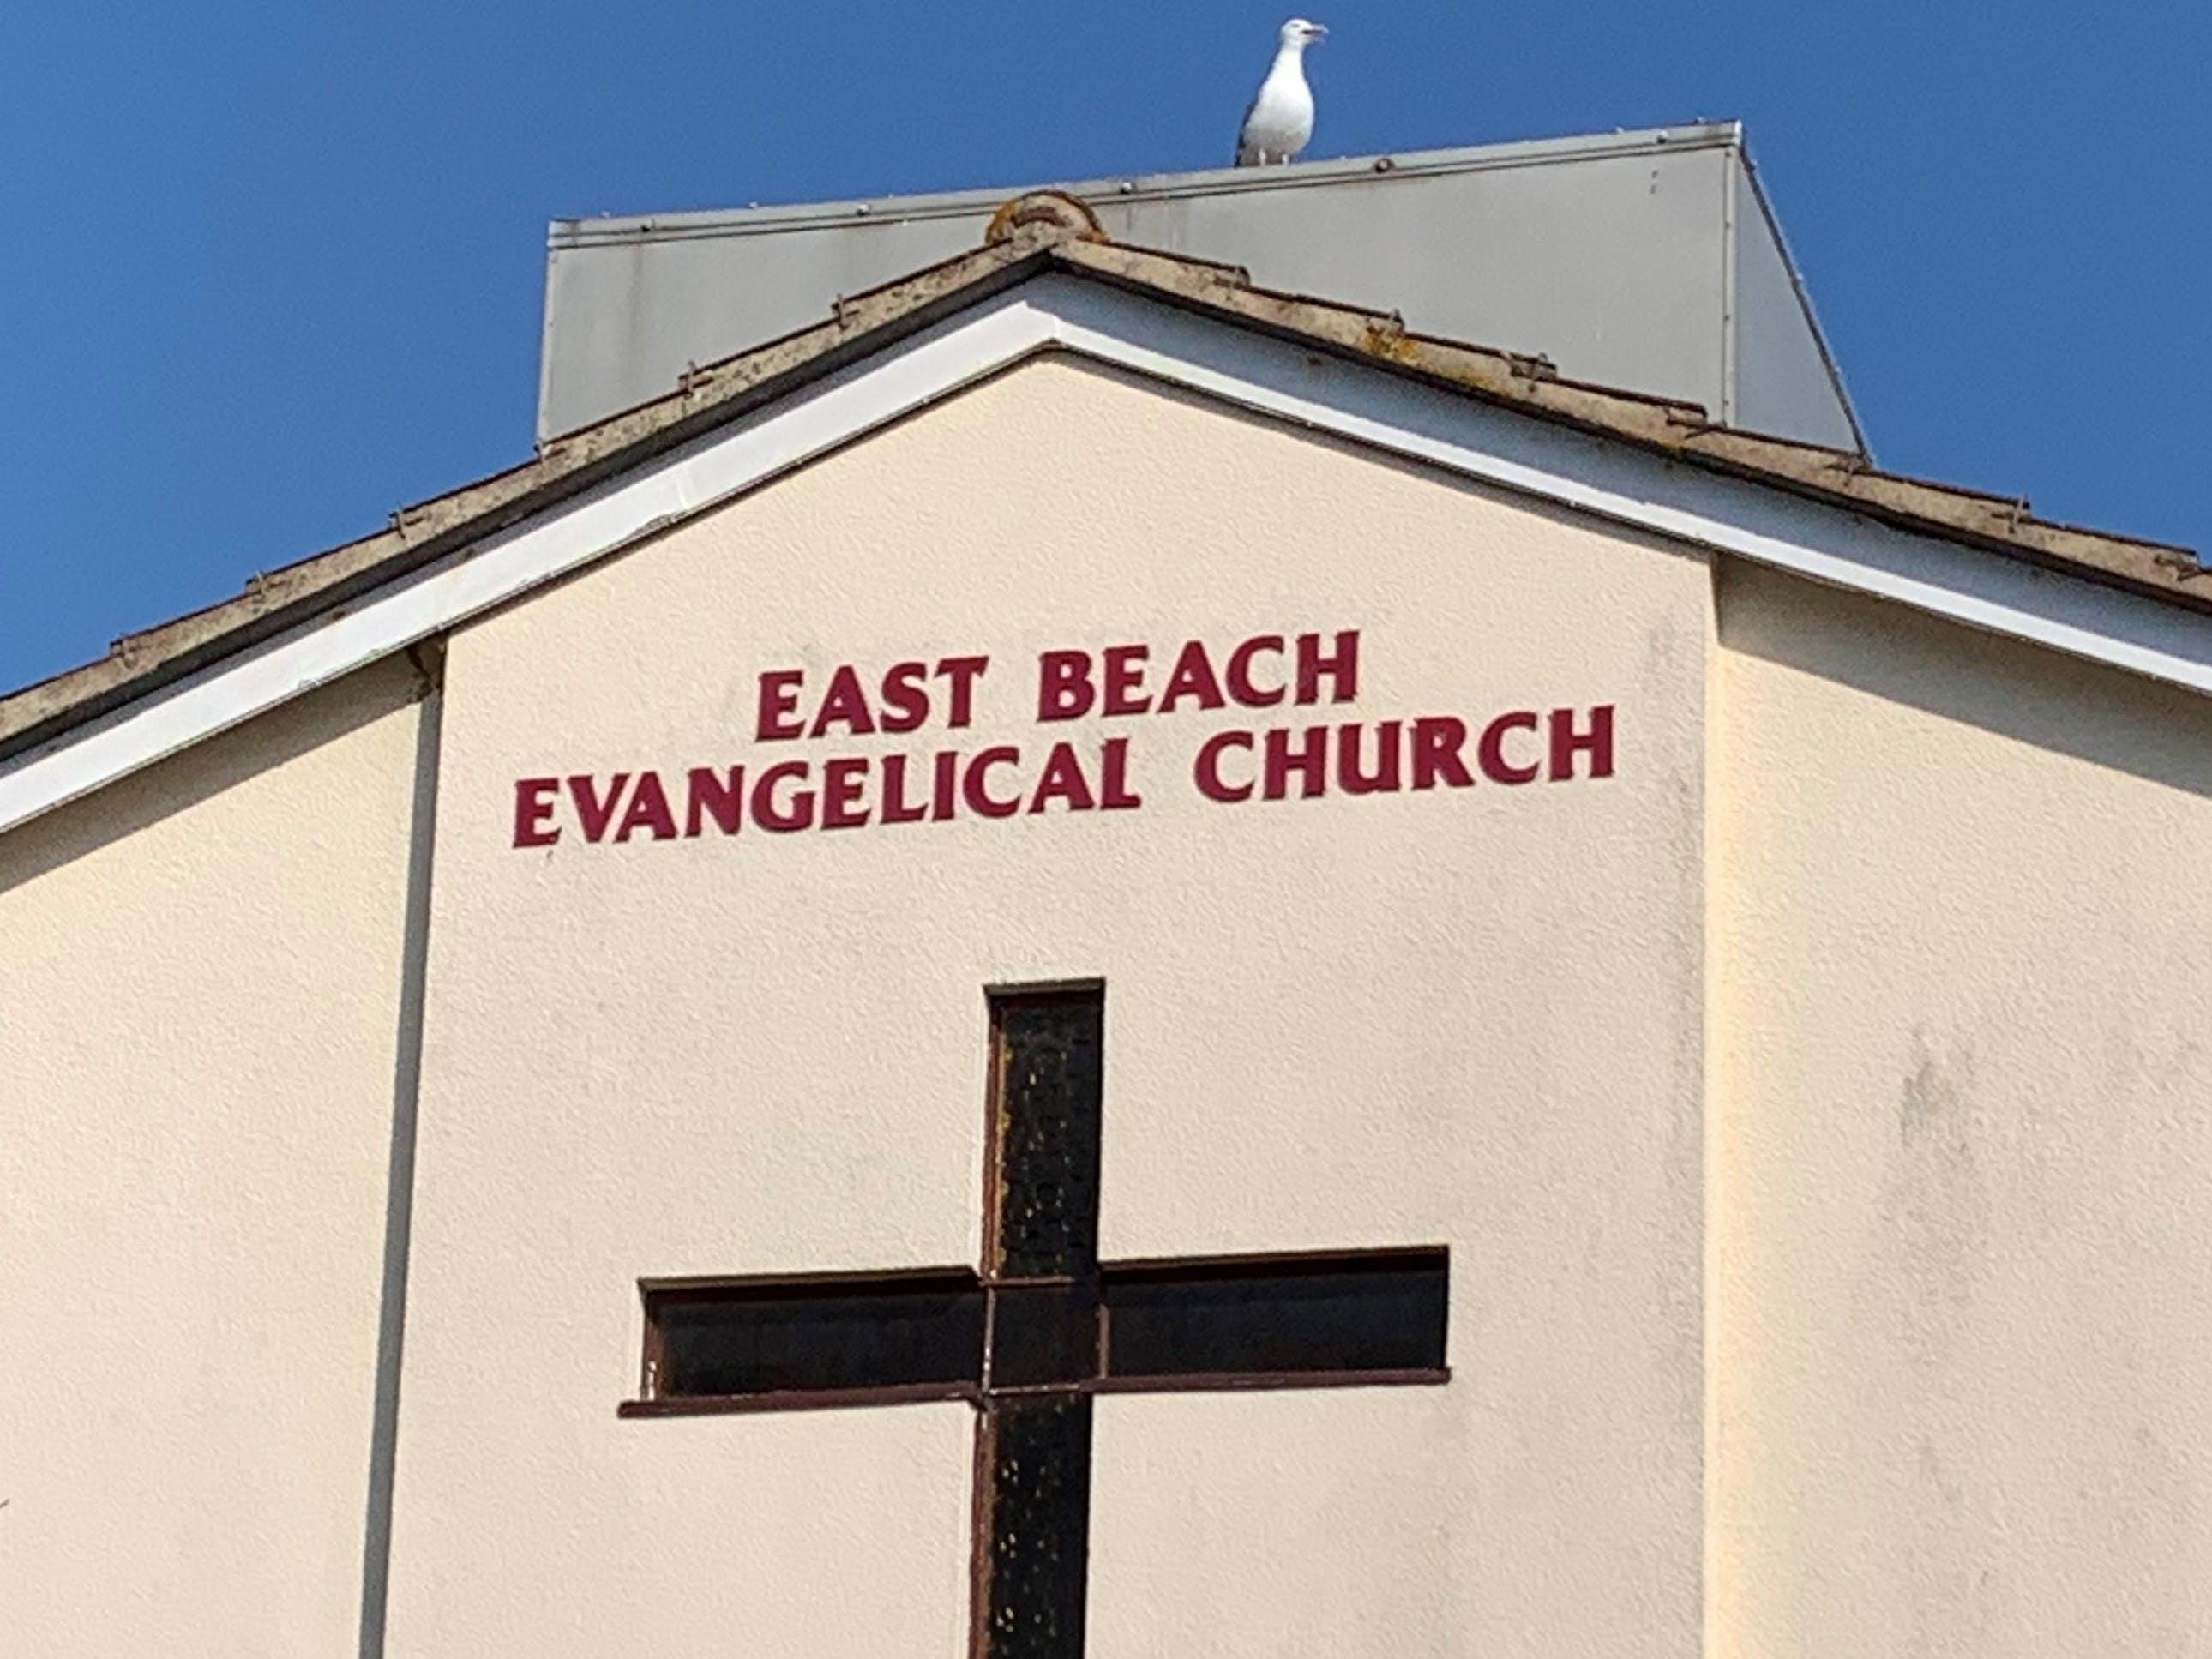 East Beach Evangelical Church, Selsey